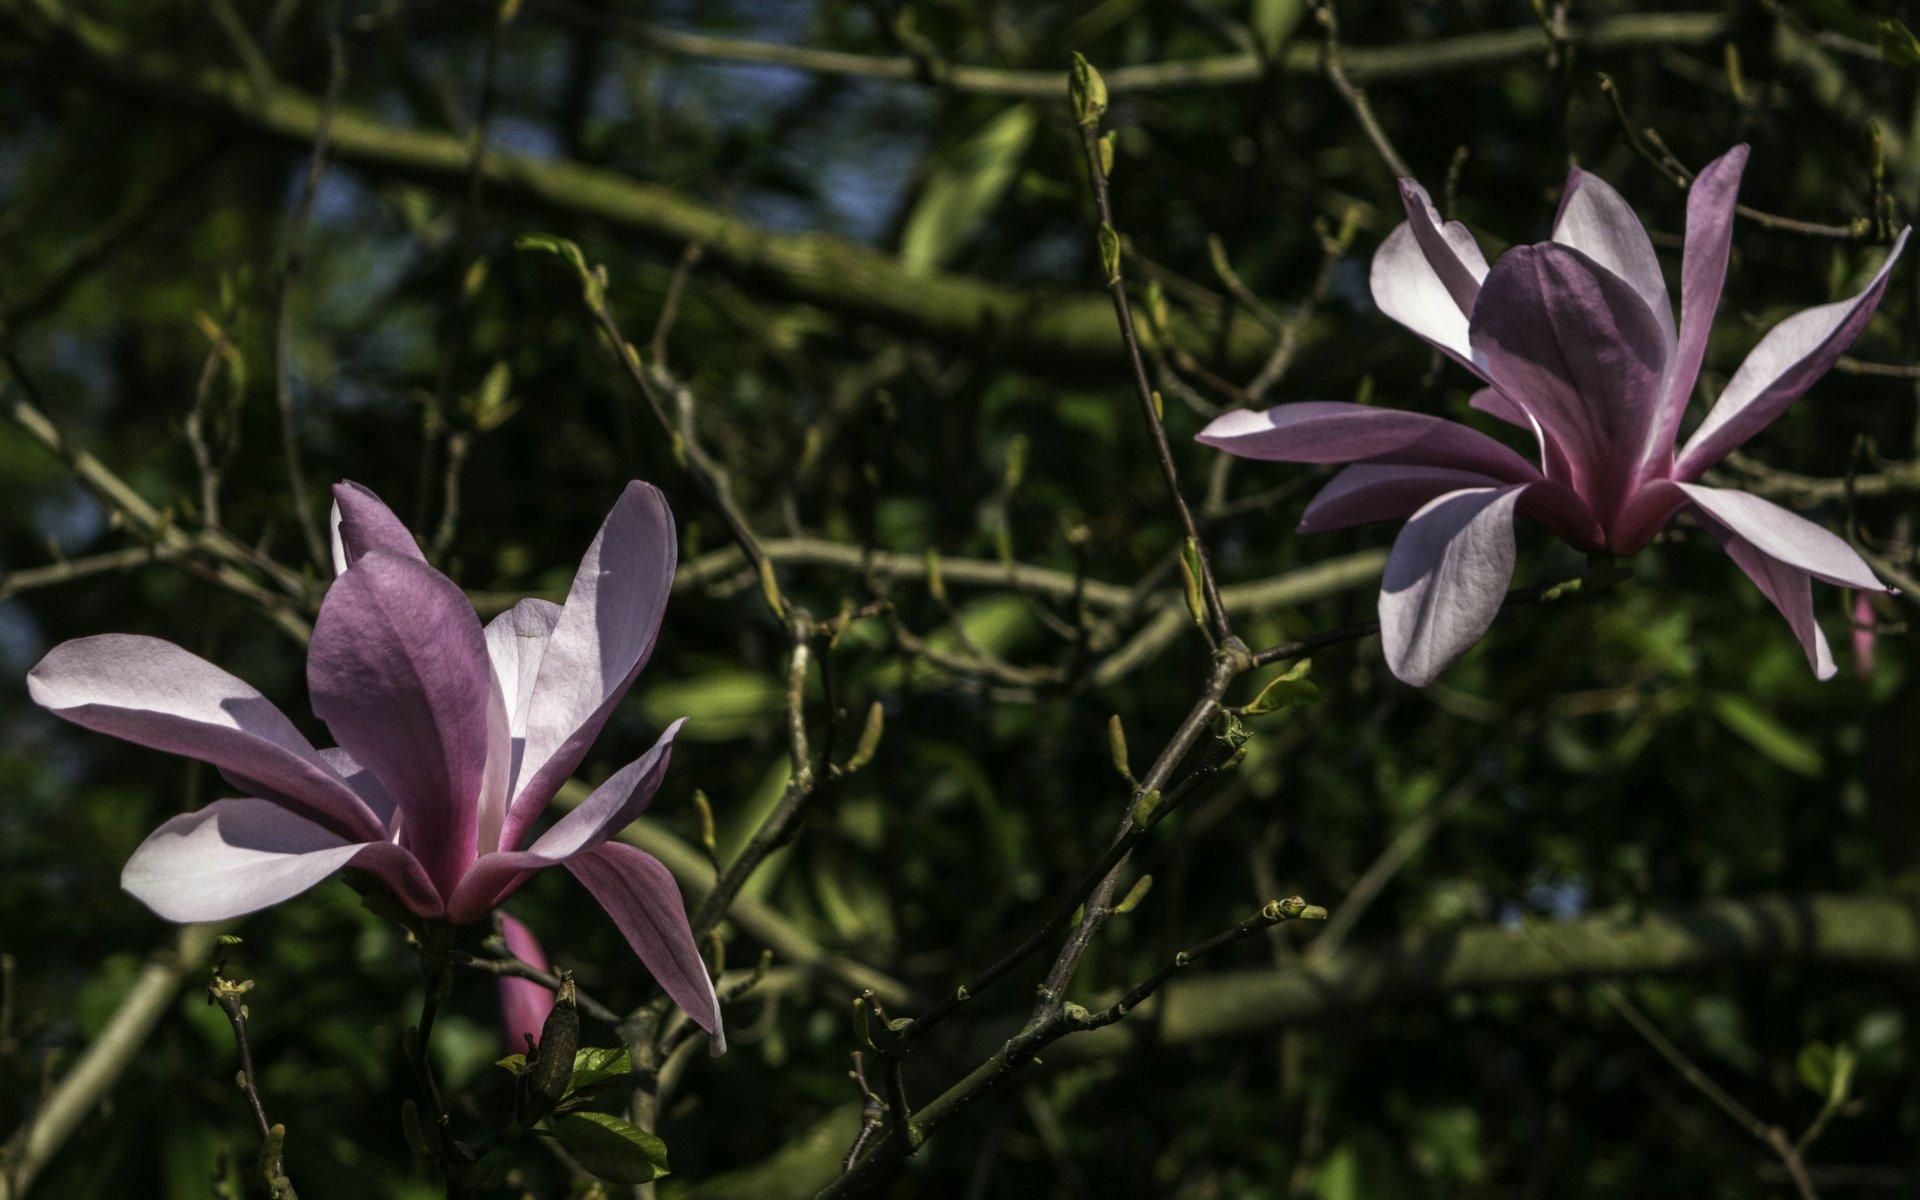 Magnolienblüten im Rhododendrenhain des Berggartens